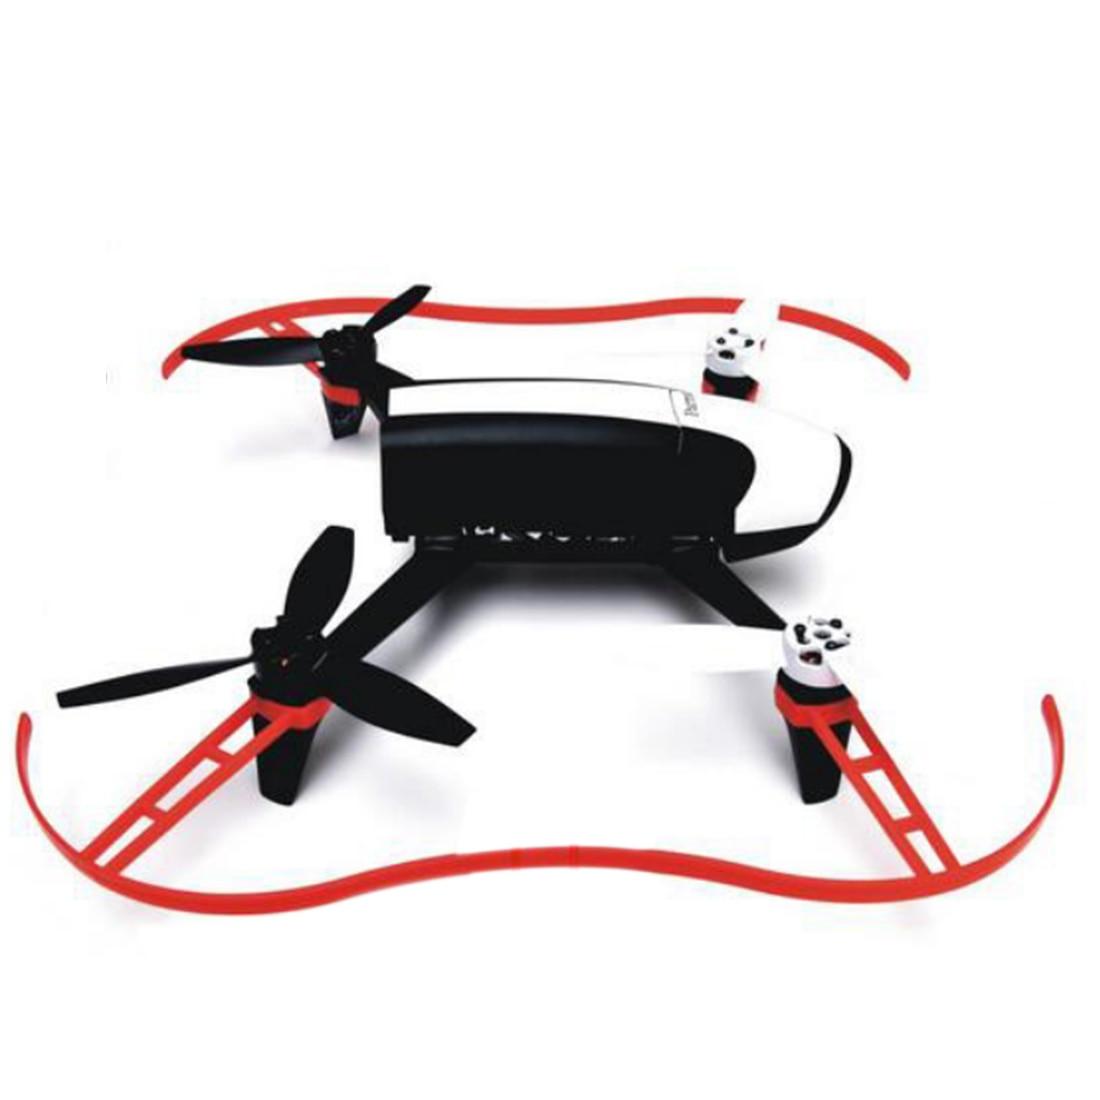 SNOWINSPRING Drone Bumper Elica Puntelli Protector Ring per Parrot Bebop 2.0 Rosso